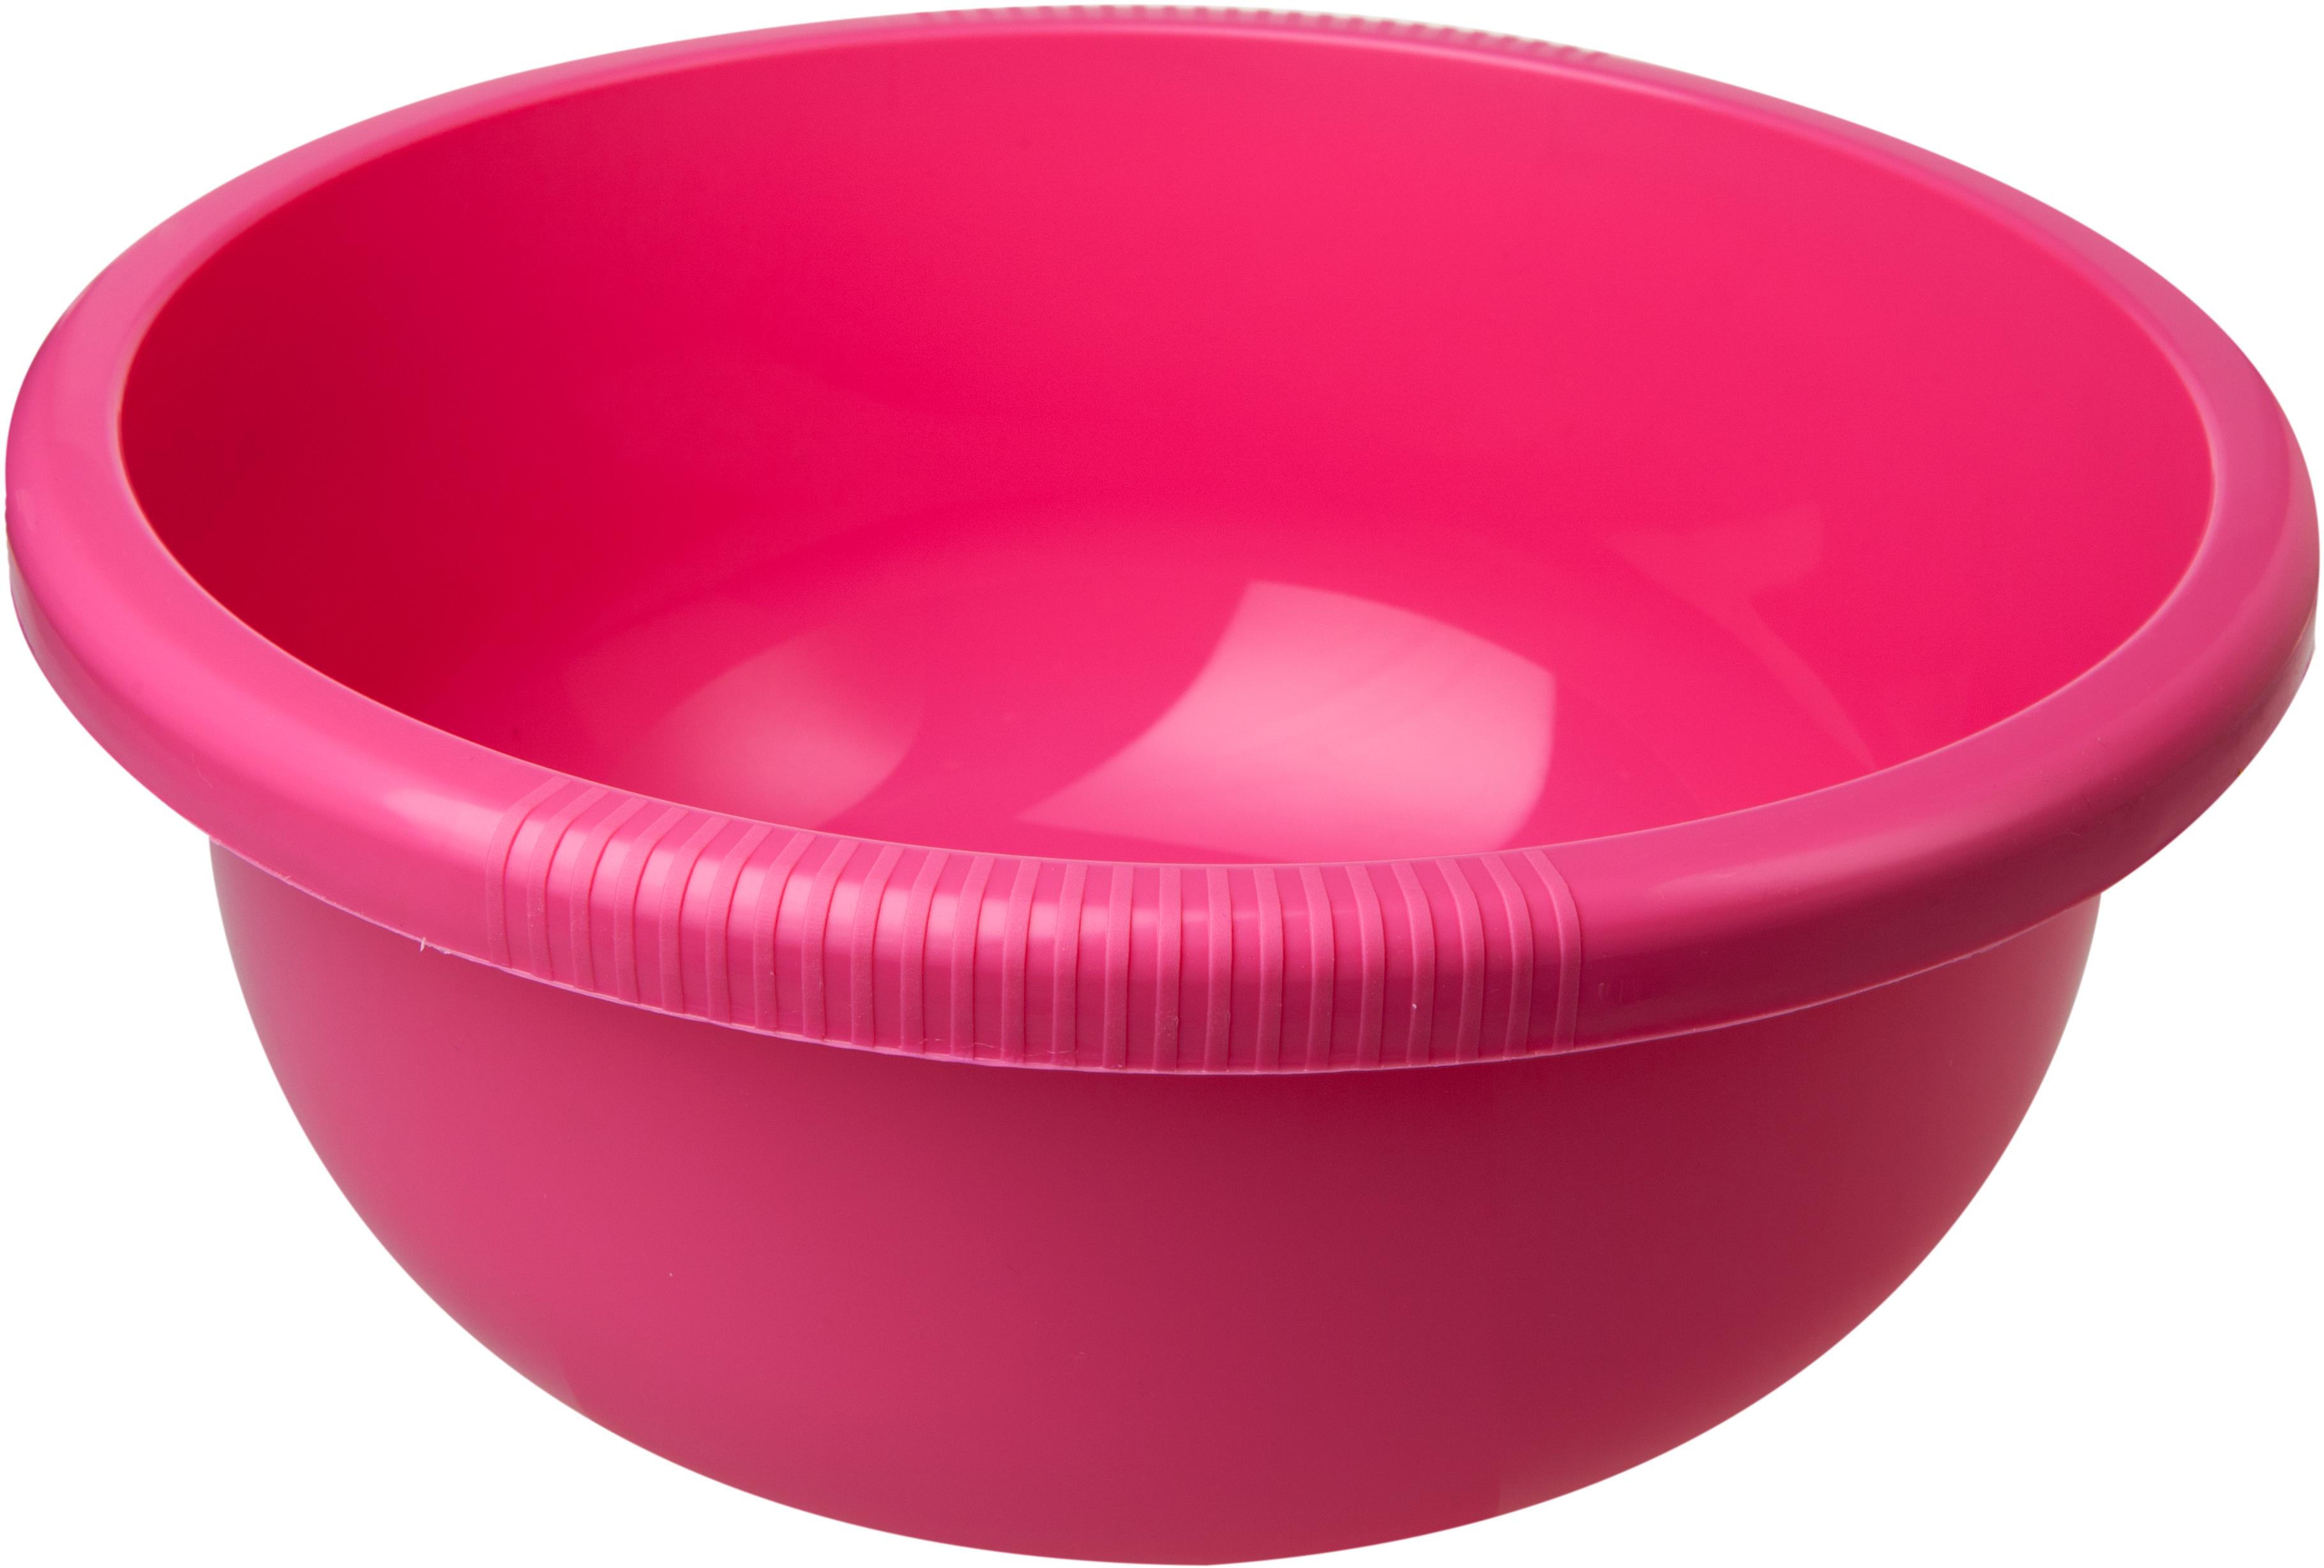 Миска Plast Team, цвет: коралловый, круглая, 4 л миска plast team с крышкой цвет пурпурный 3 2 л